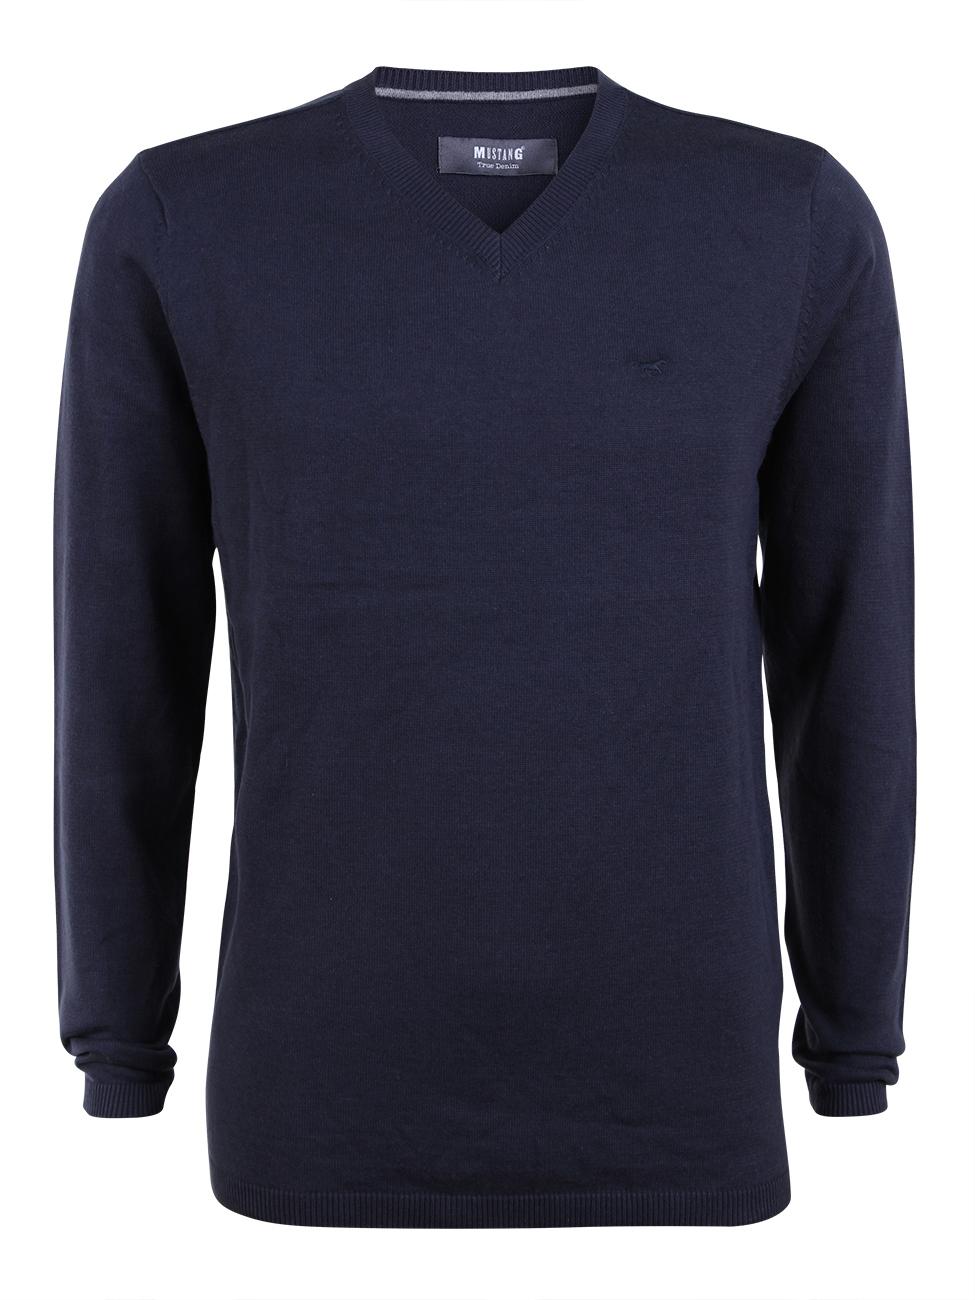 Mustang Herren Basic Pullover Baumwolle V-Neck kaufen - JEANS-DIRECT.DE aeb21f8ecf